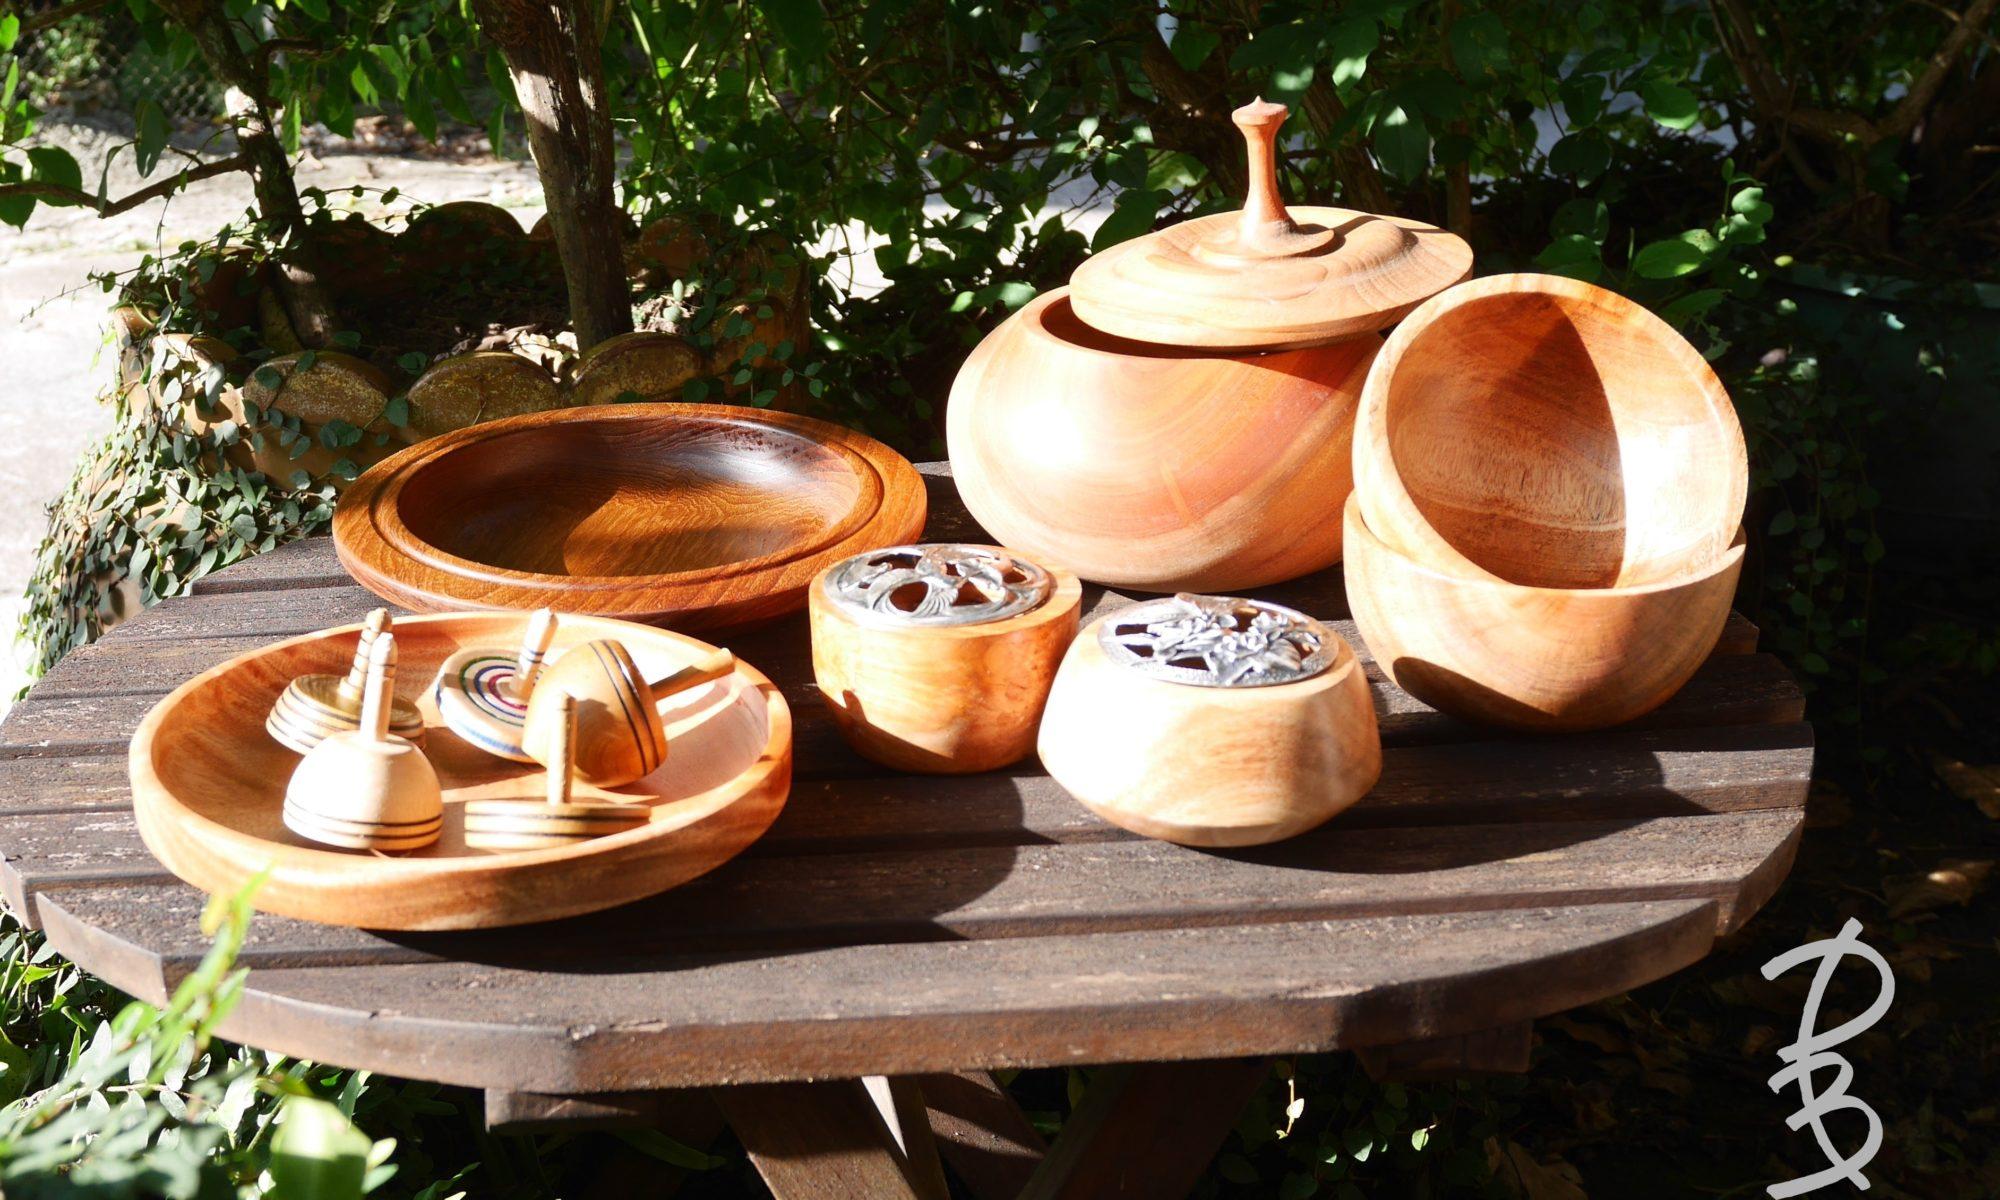 PB Woodenware